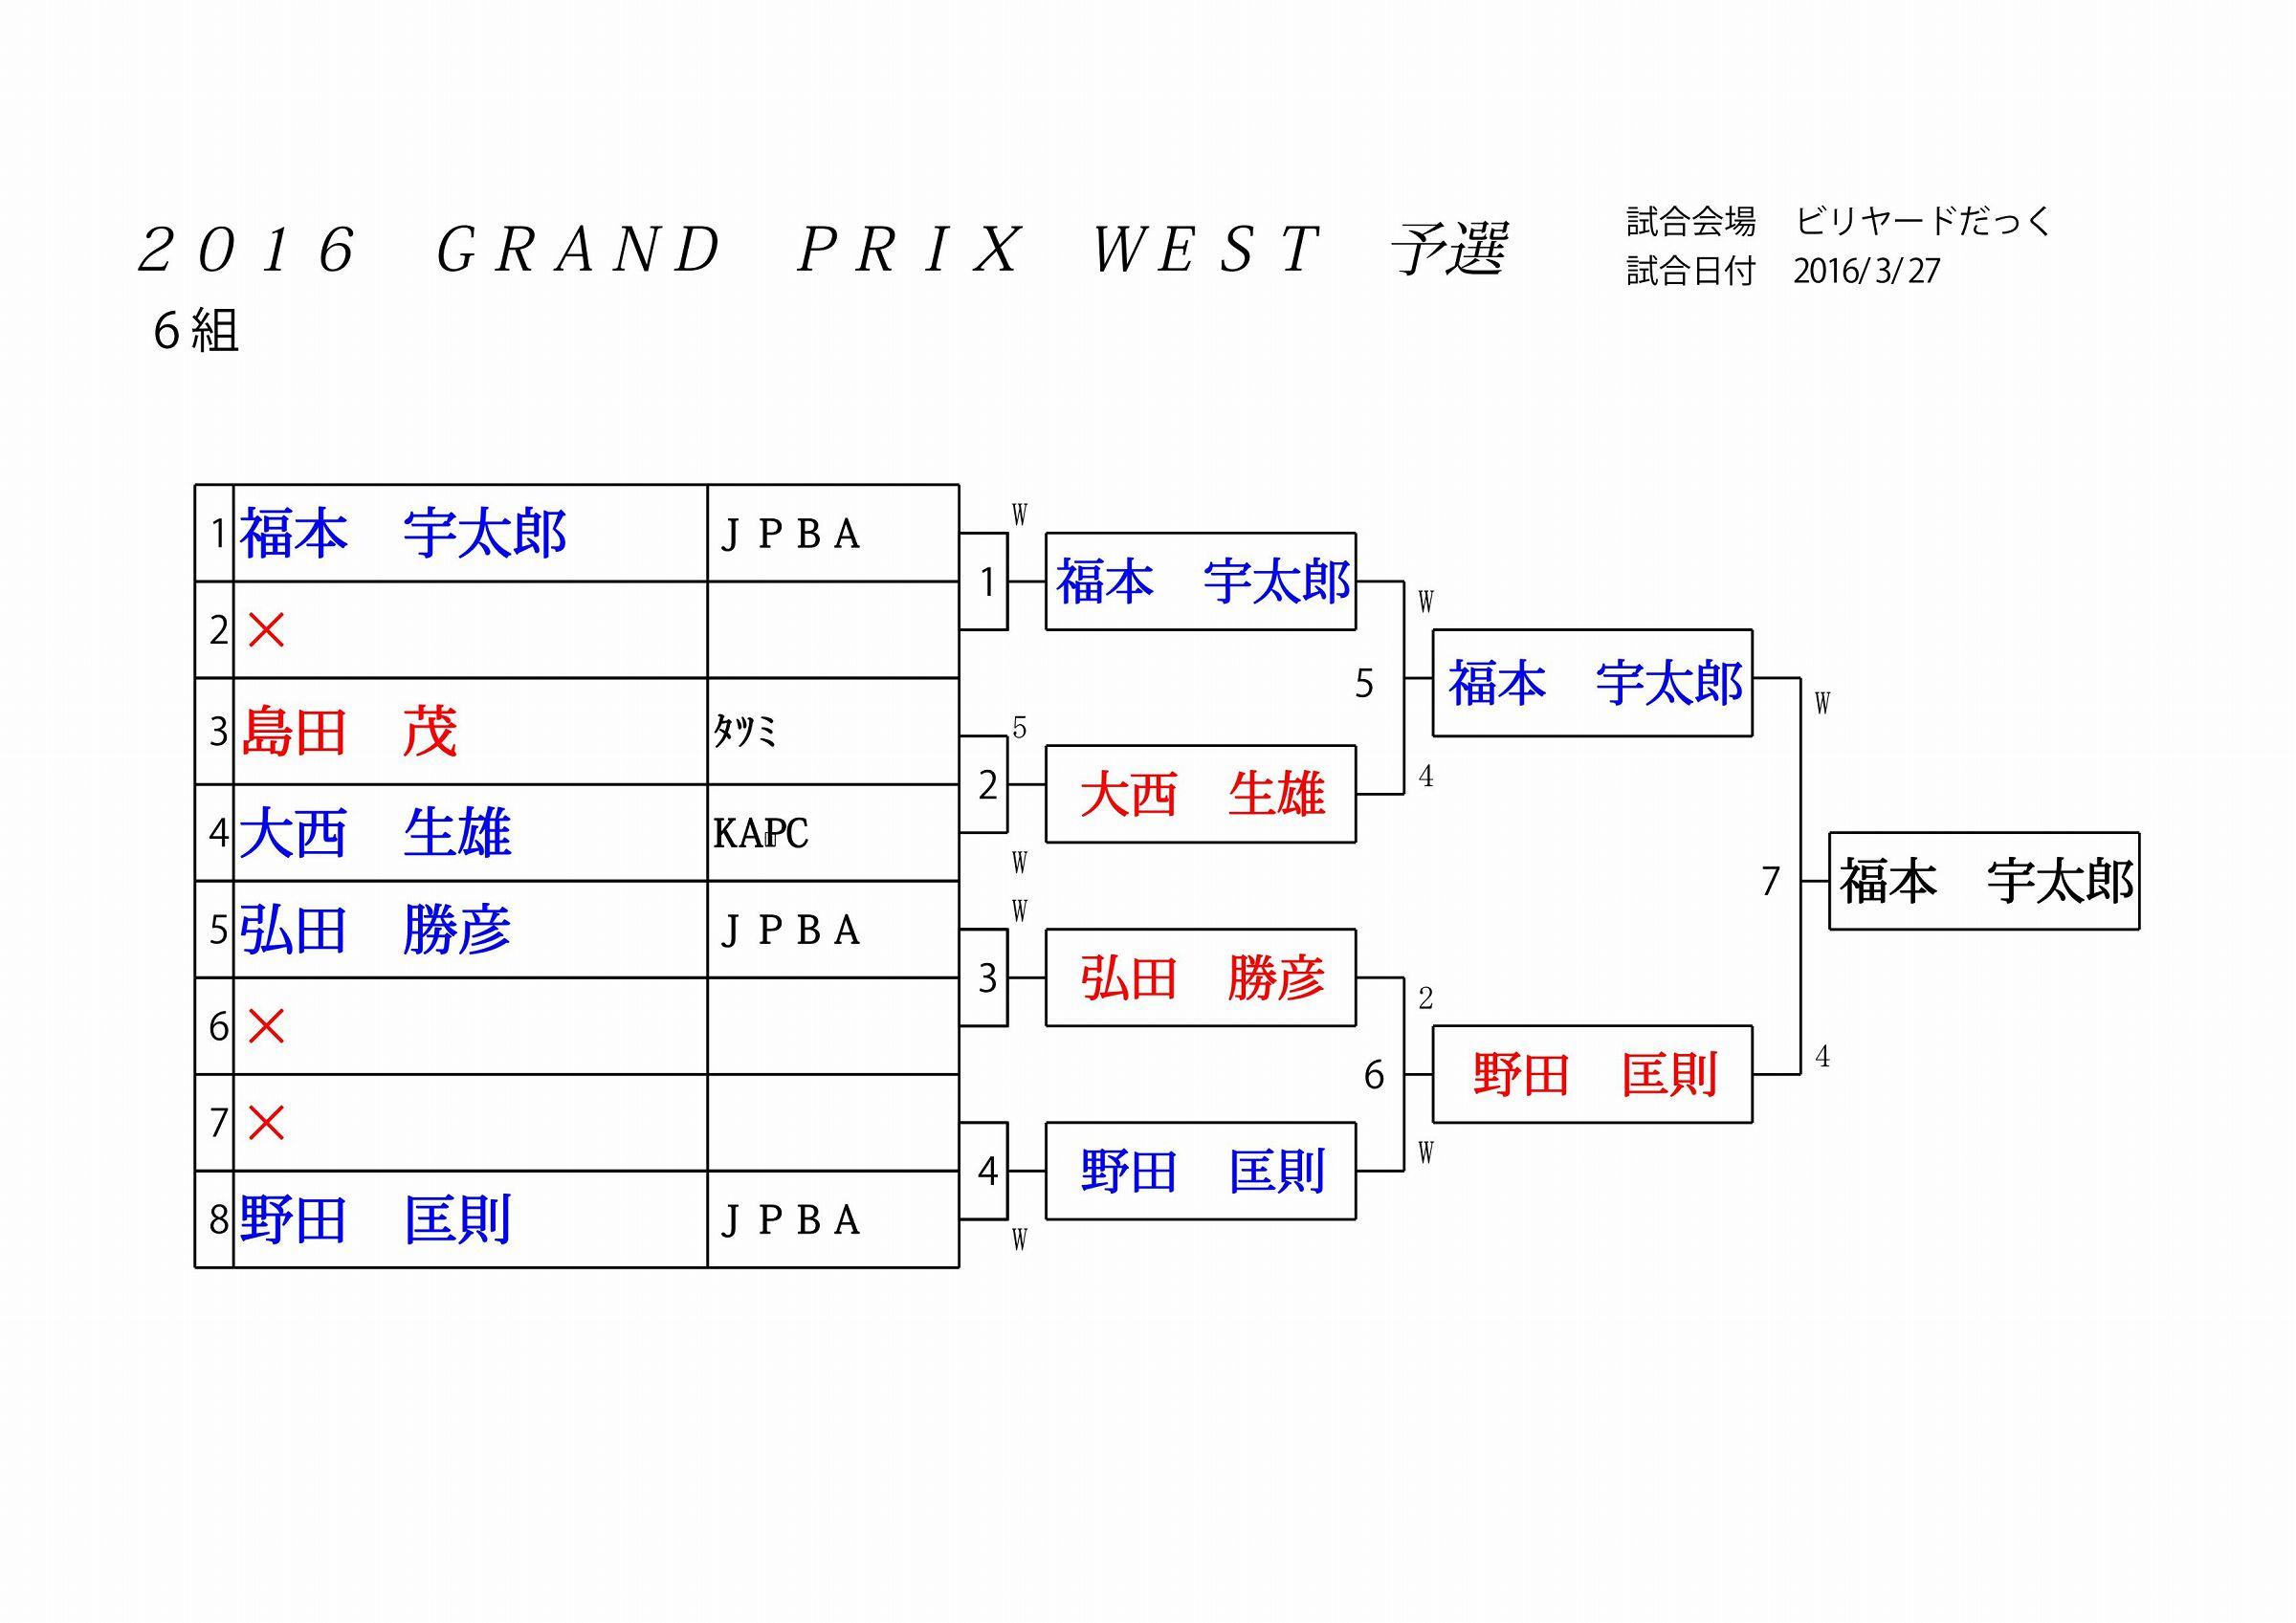 2016 GRAND PRIX WEST 予選_06